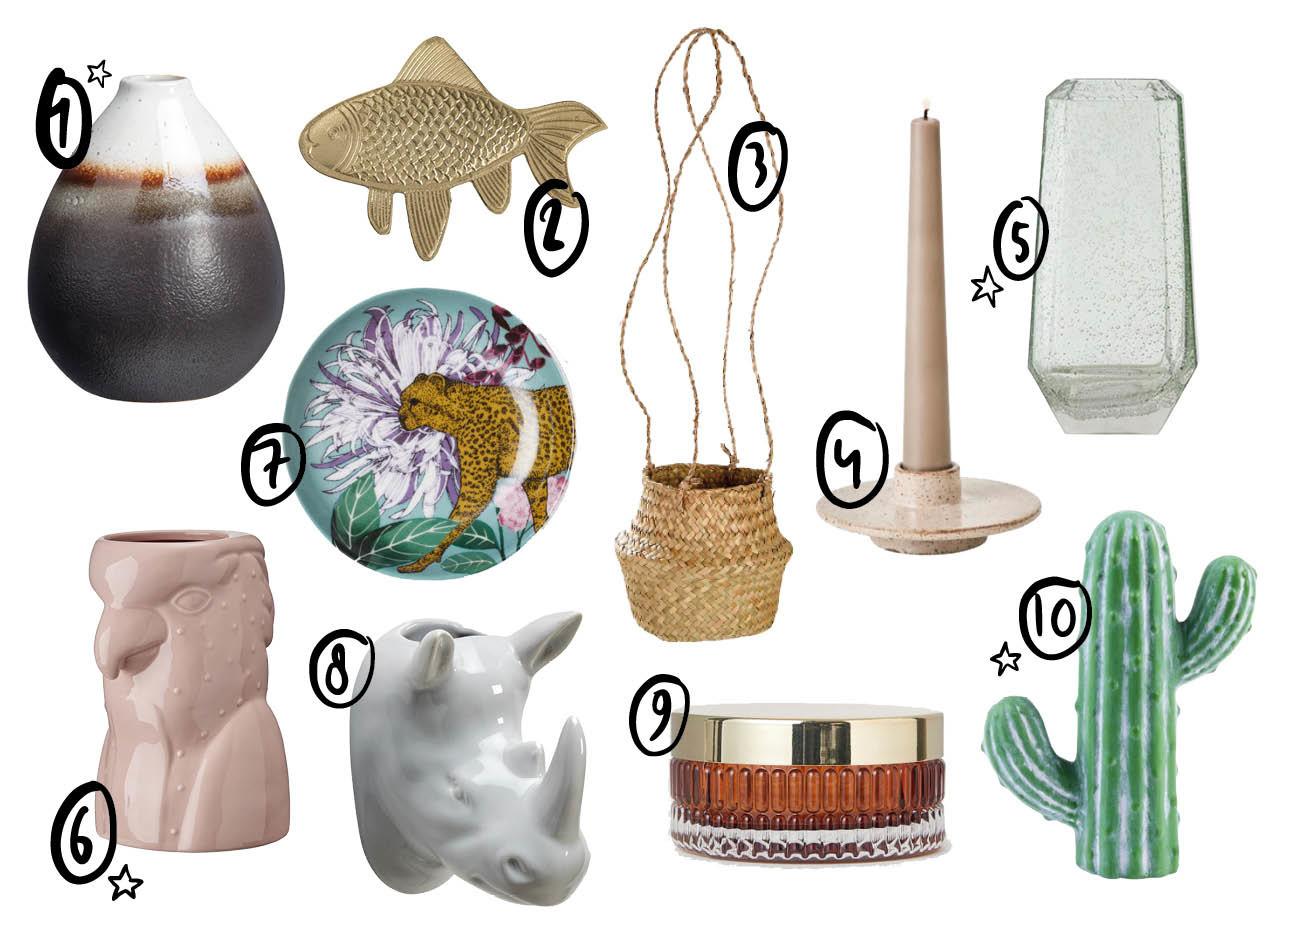 interieur shopping items 10 euro